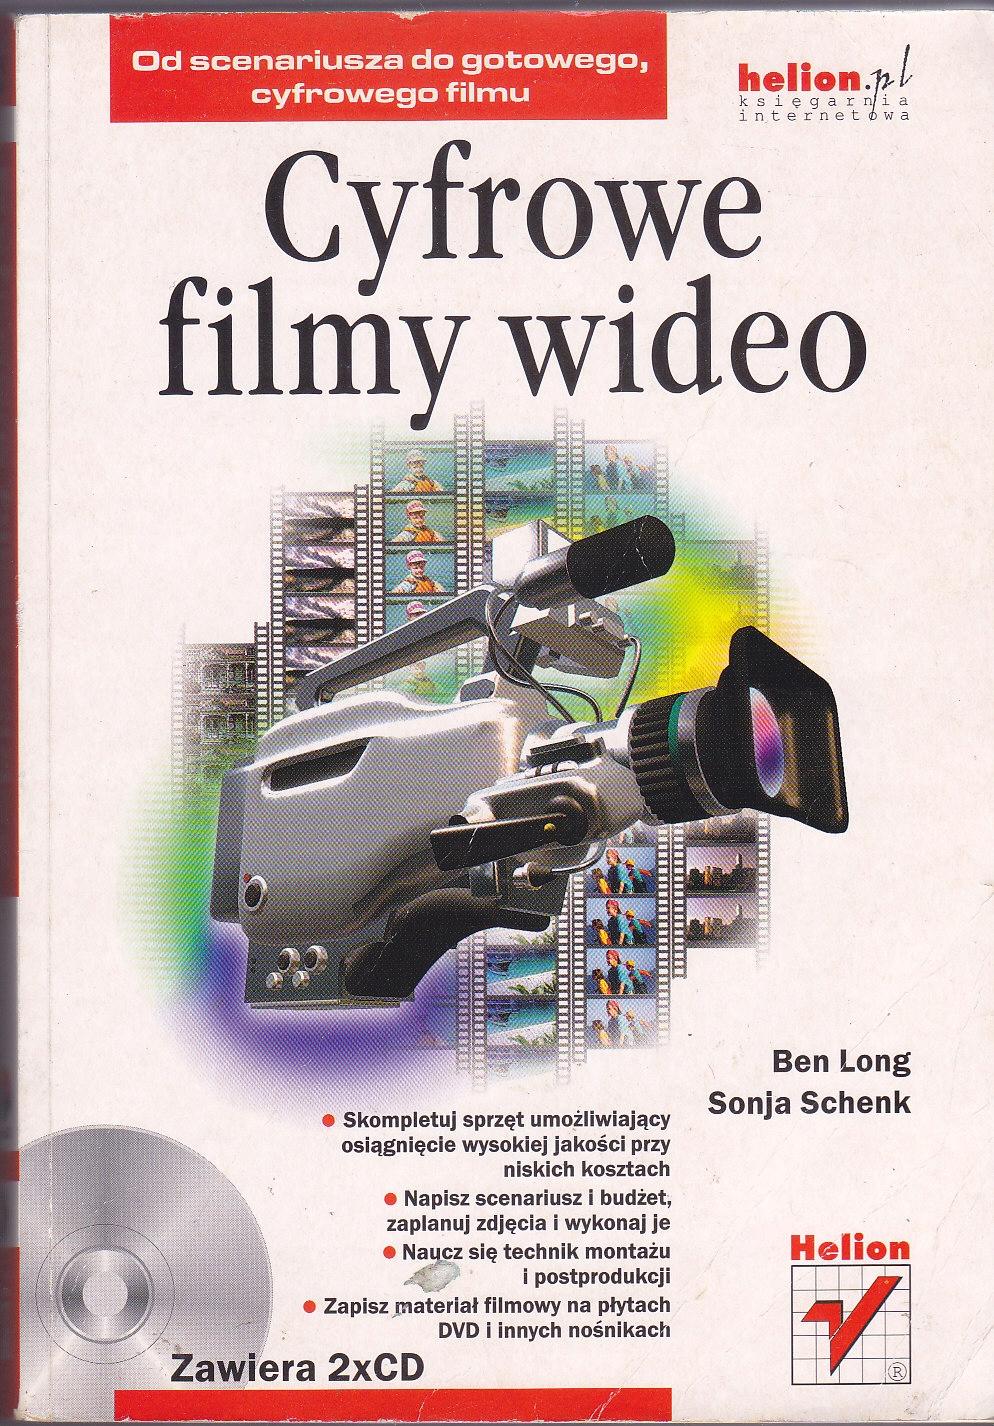 Cyfrowe filmy wideo.